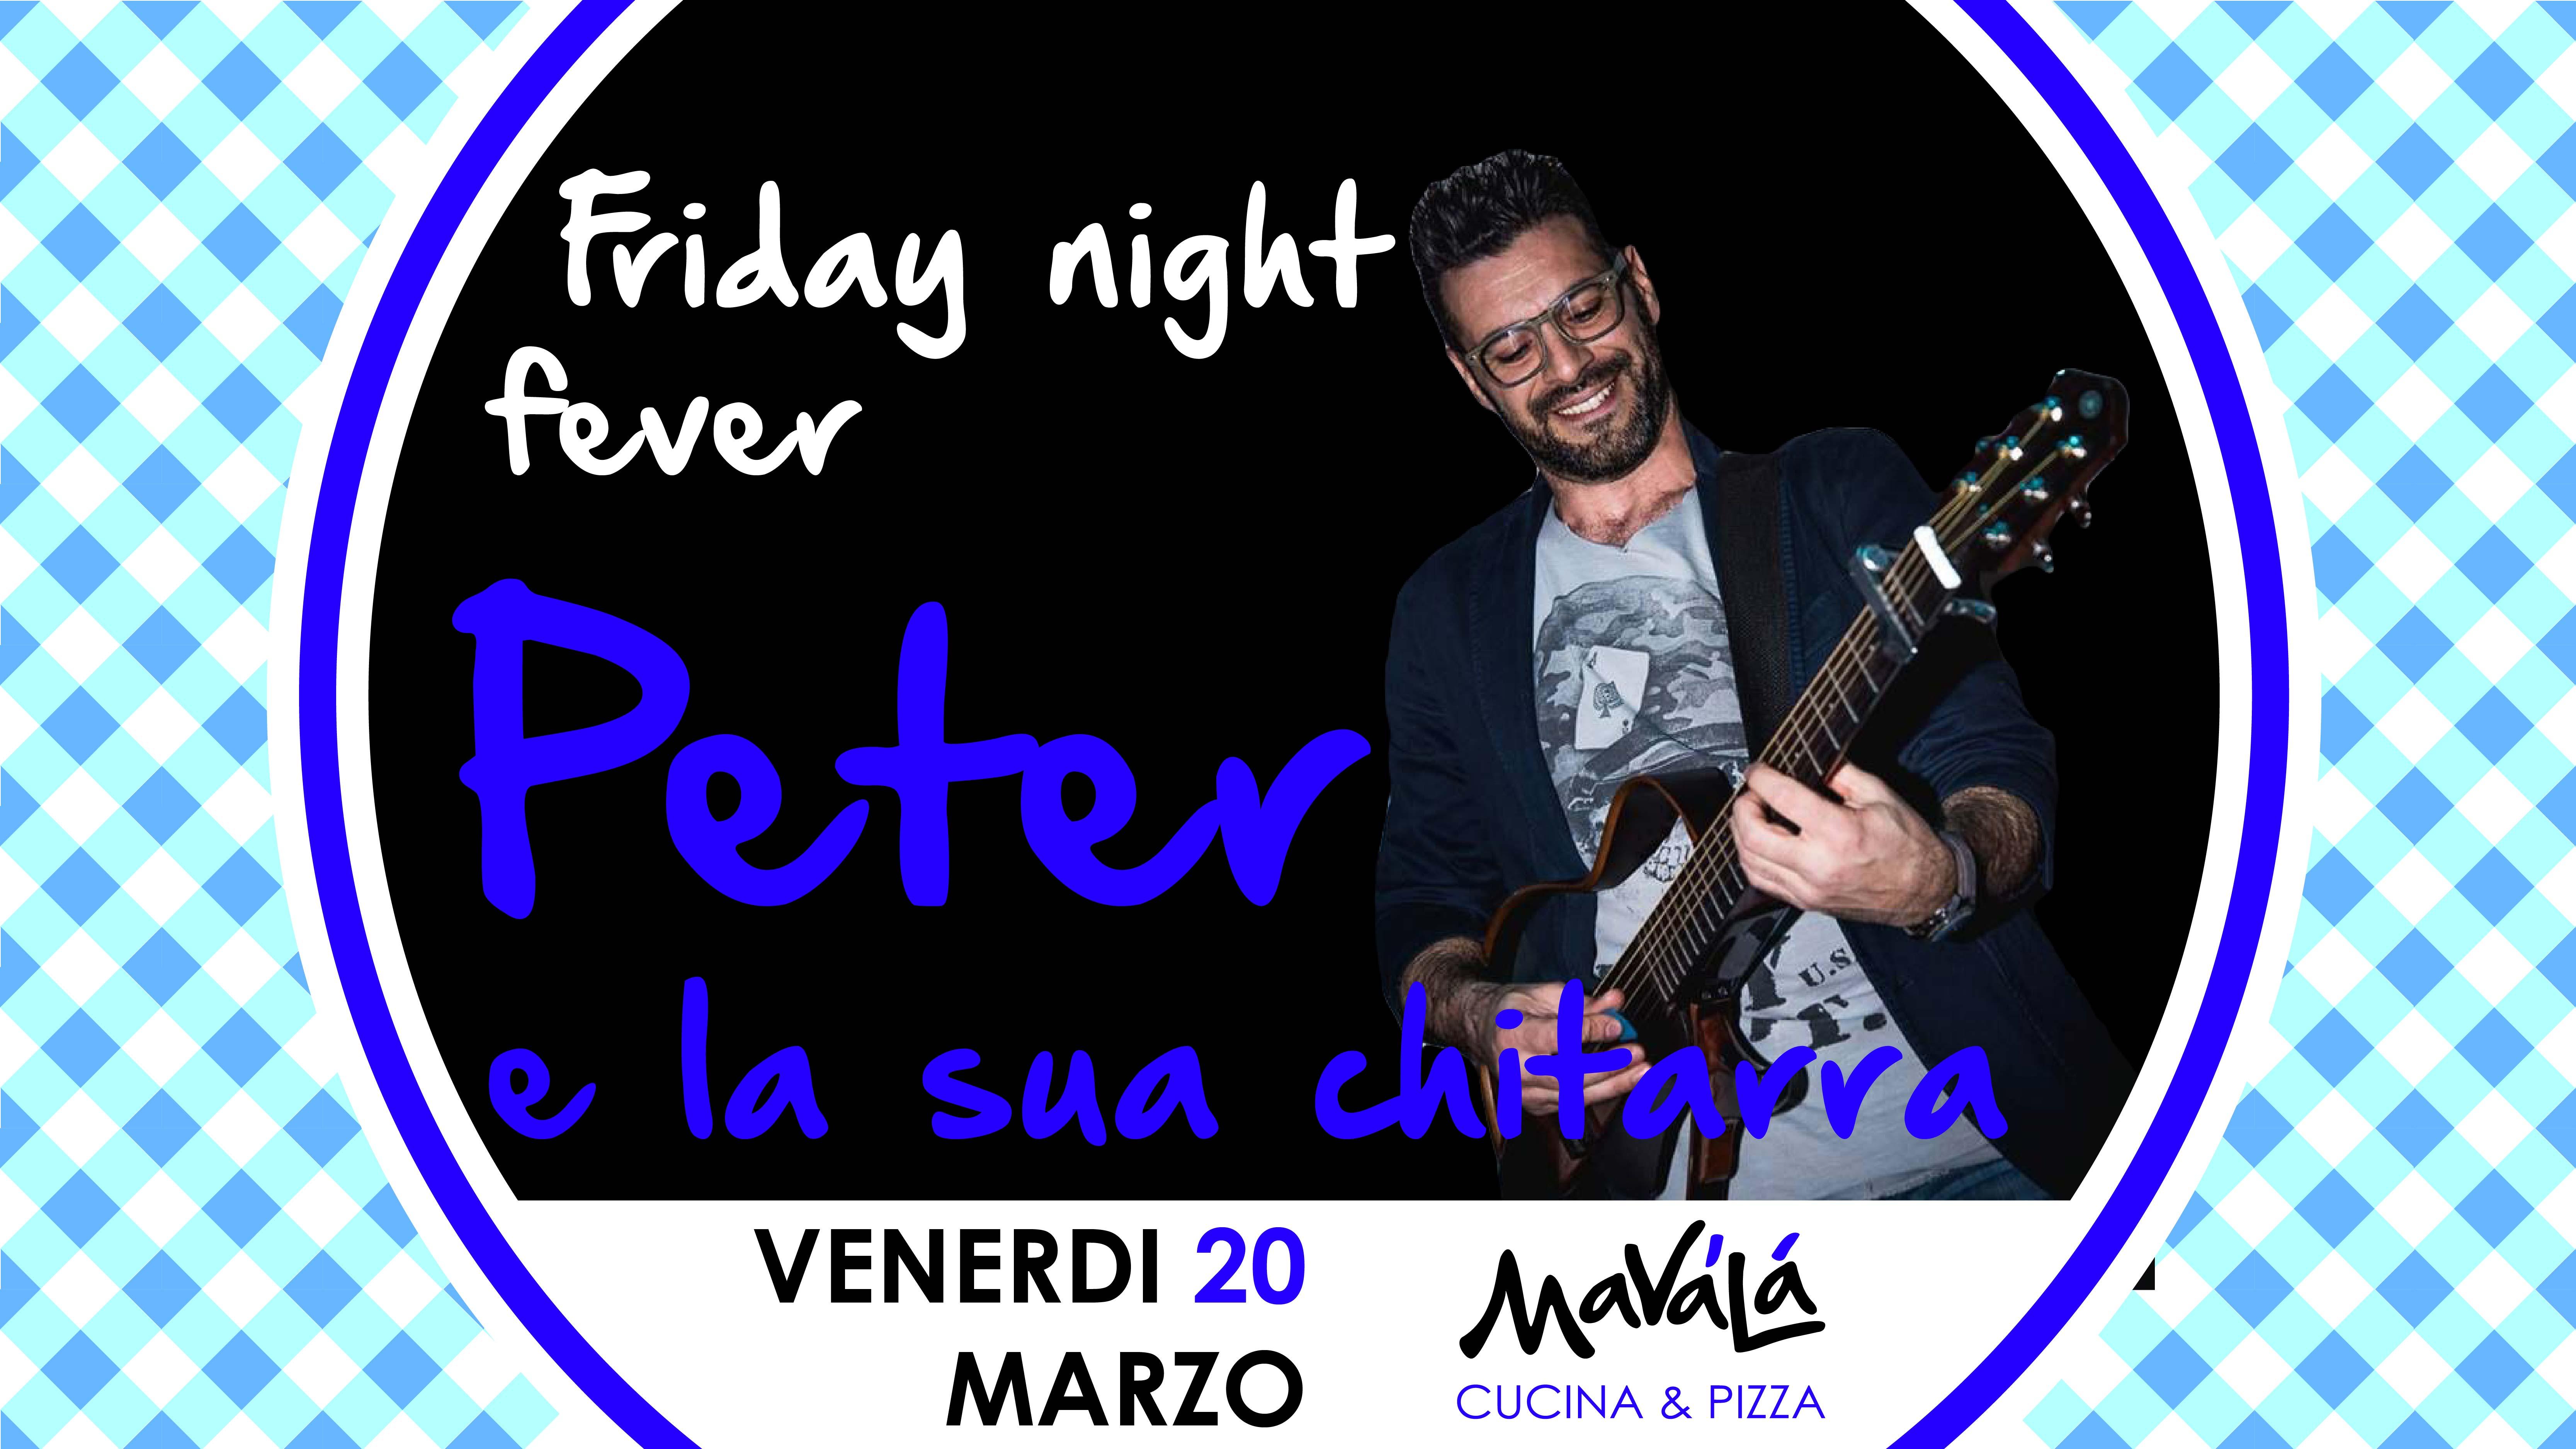 MAVALA_LOCANDINE_MARZO_20_PETER-04